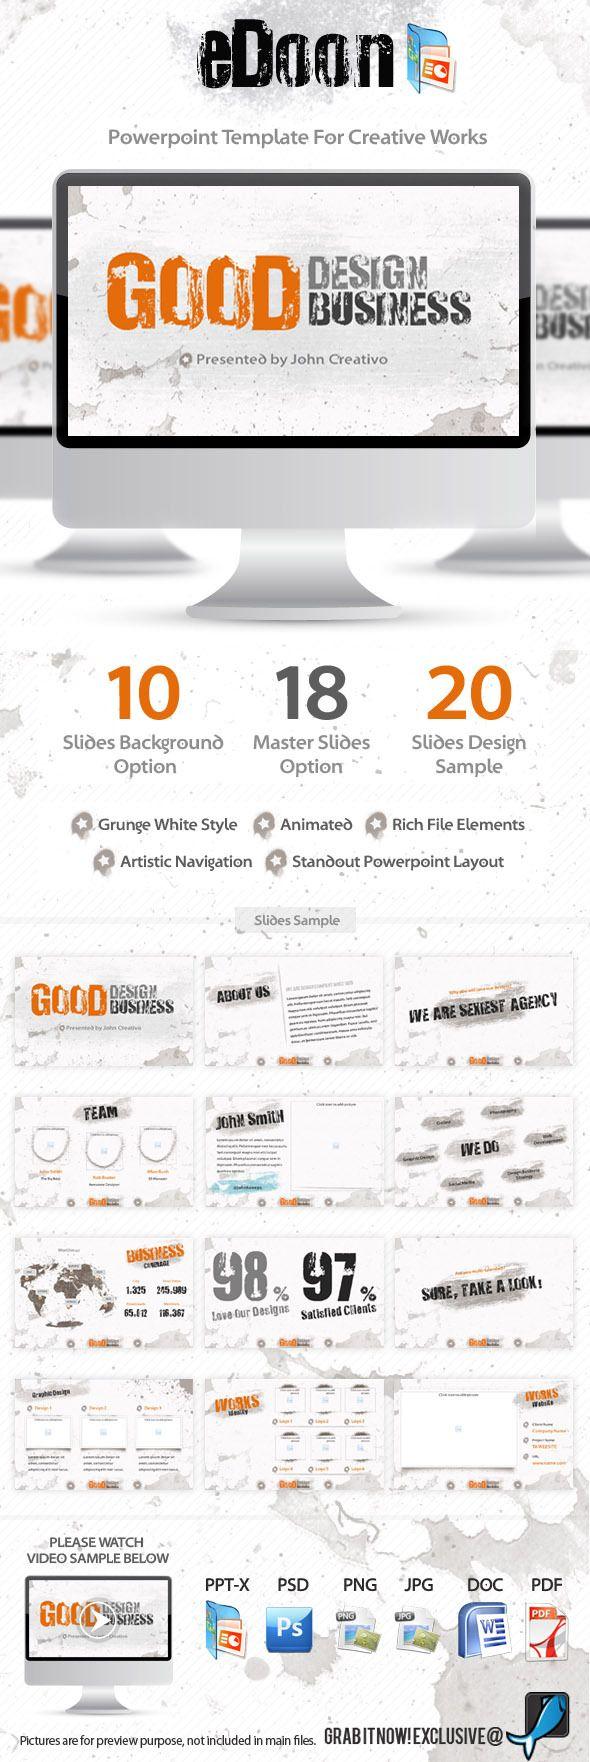 13 best powerpoints images on pinterest presentation layout edoon powerpoint template for creative works toneelgroepblik Gallery